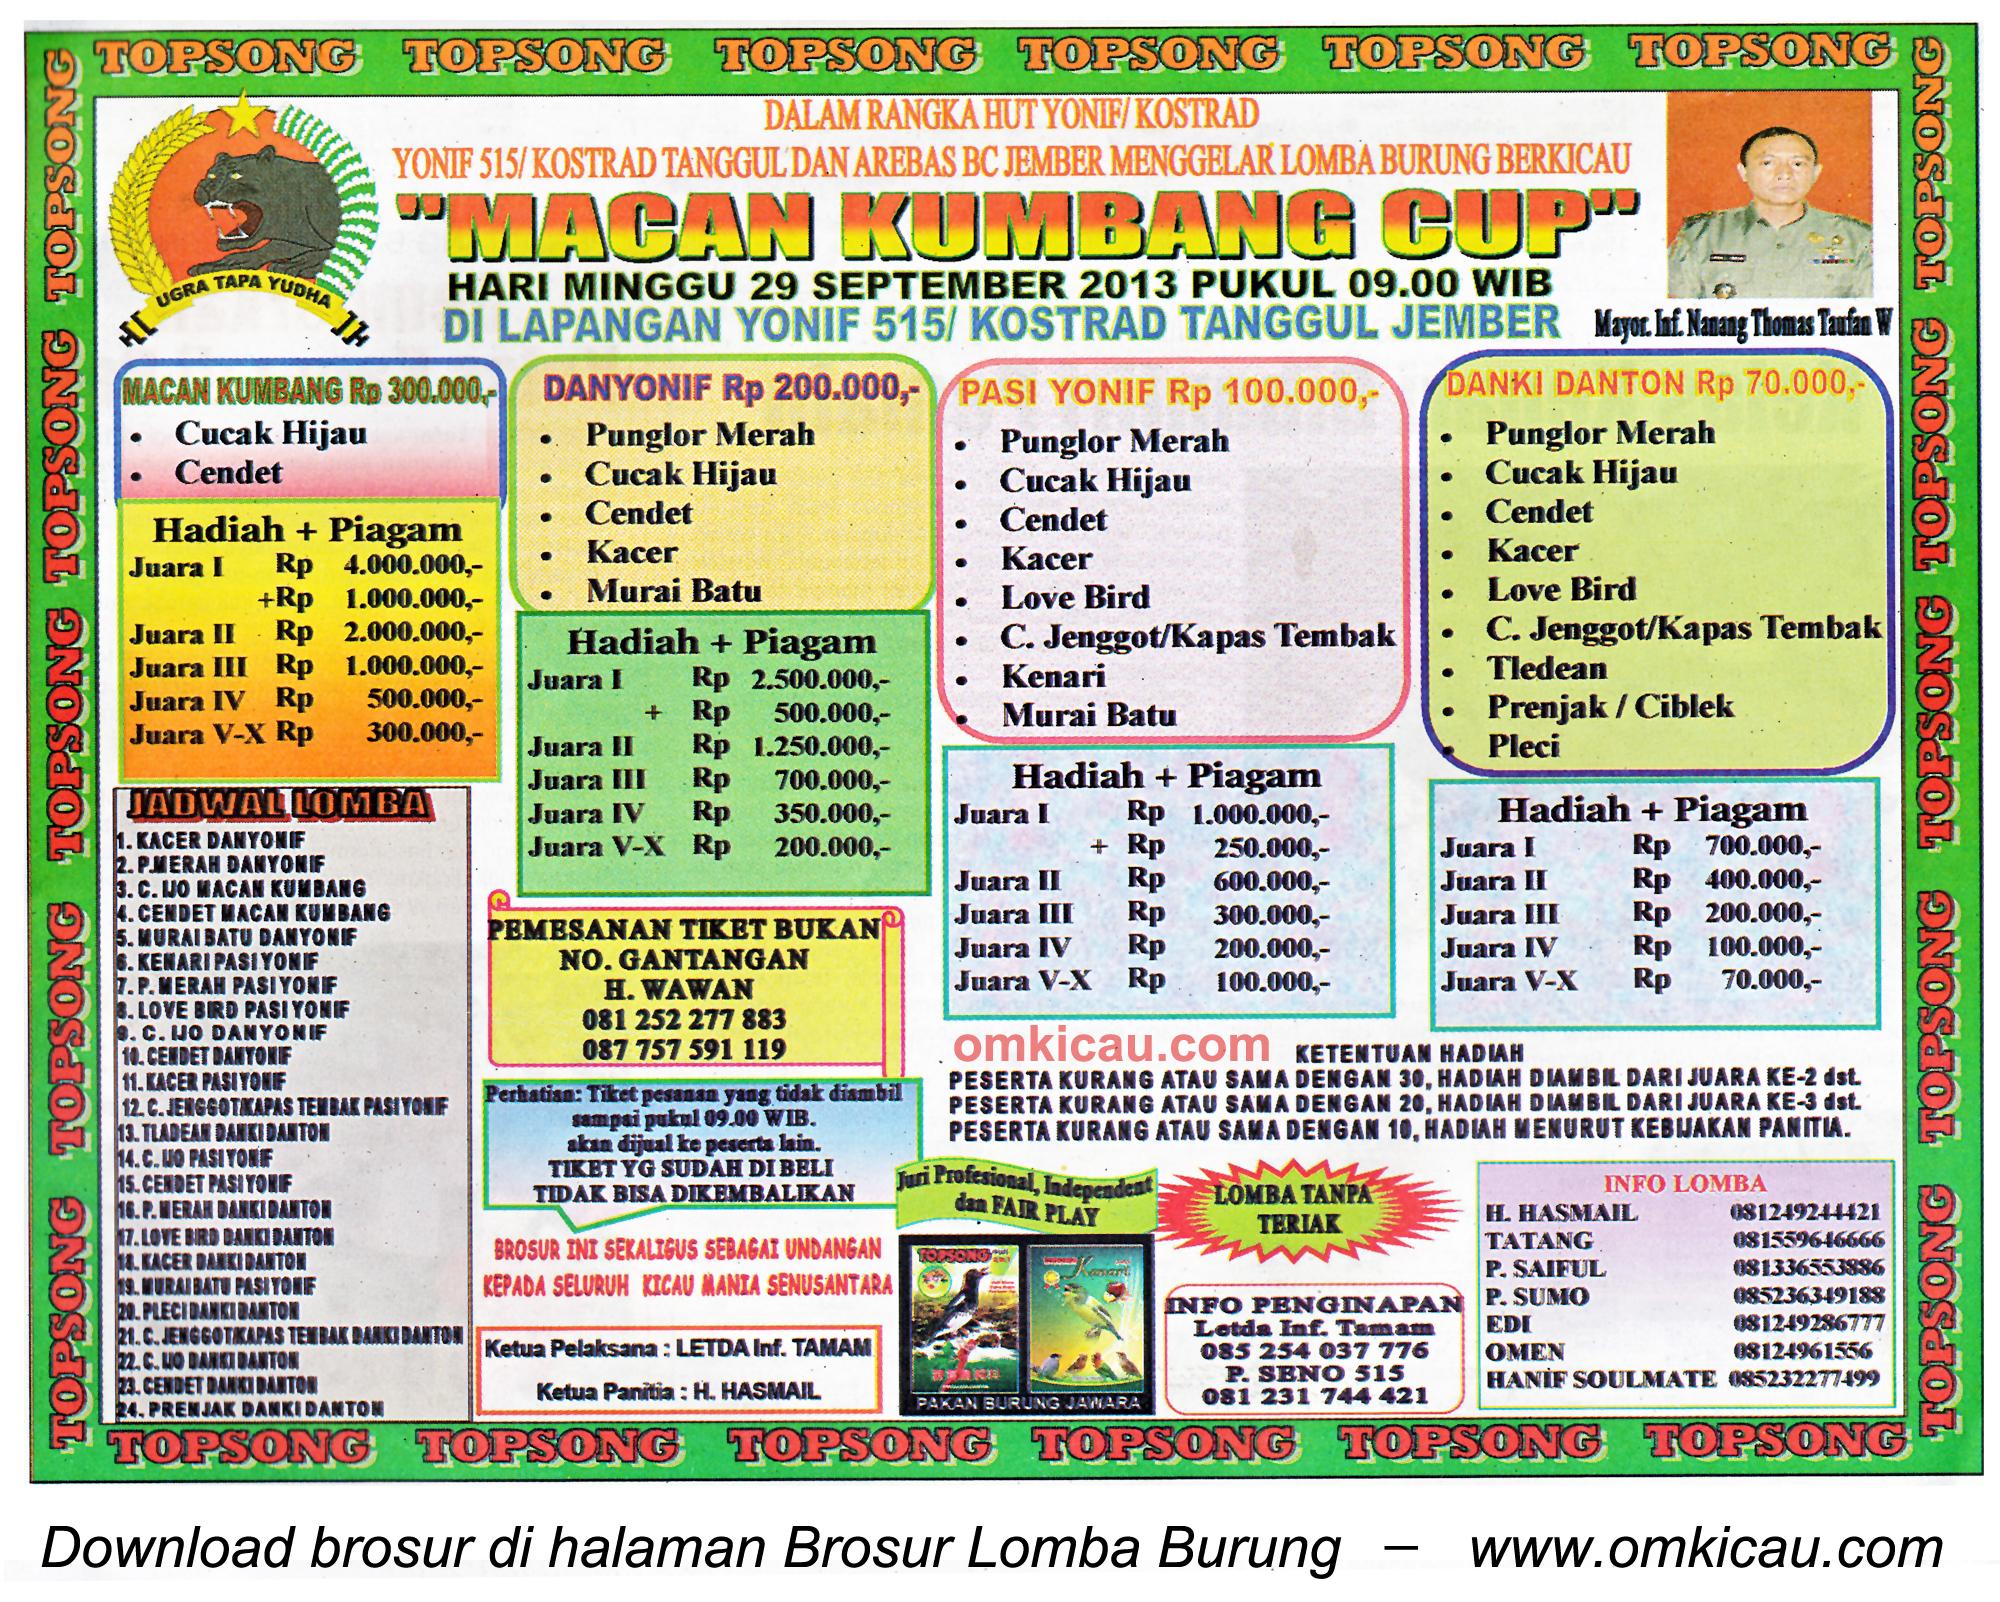 Brosur Lomba Burung Macan Kumbang Cup, Jember, 29 September 2013